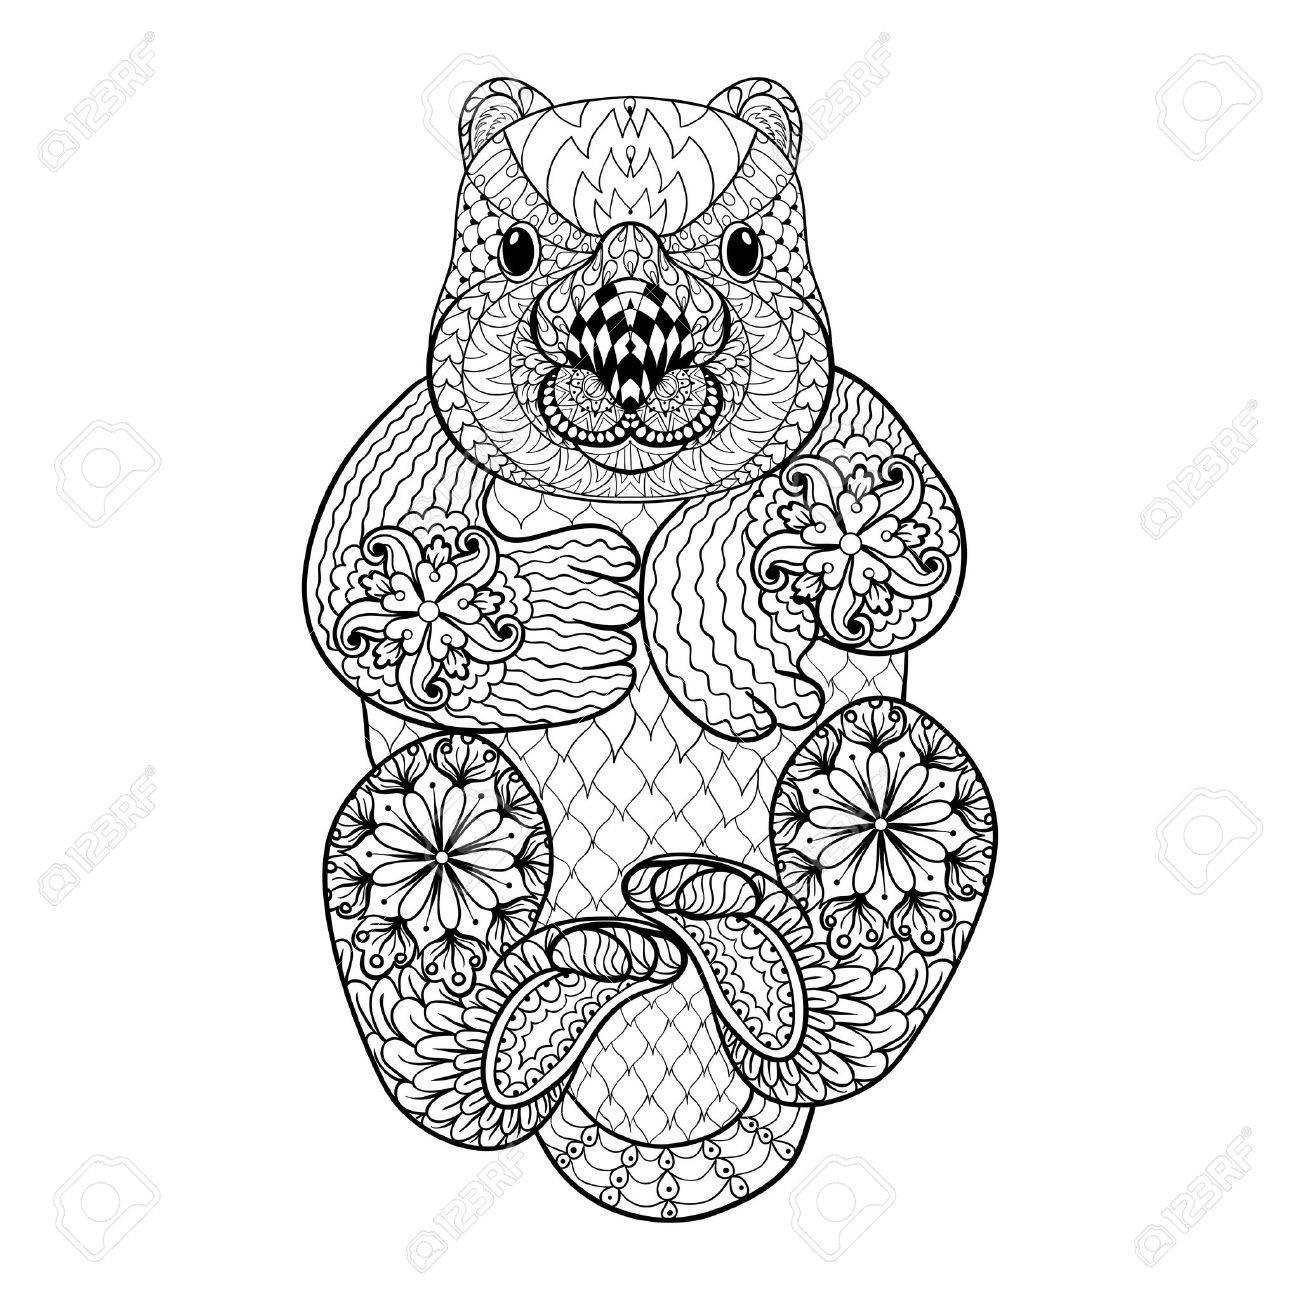 Dibujado A Mano Wombat Tribal Totem Animal Adulto Para Colorear En